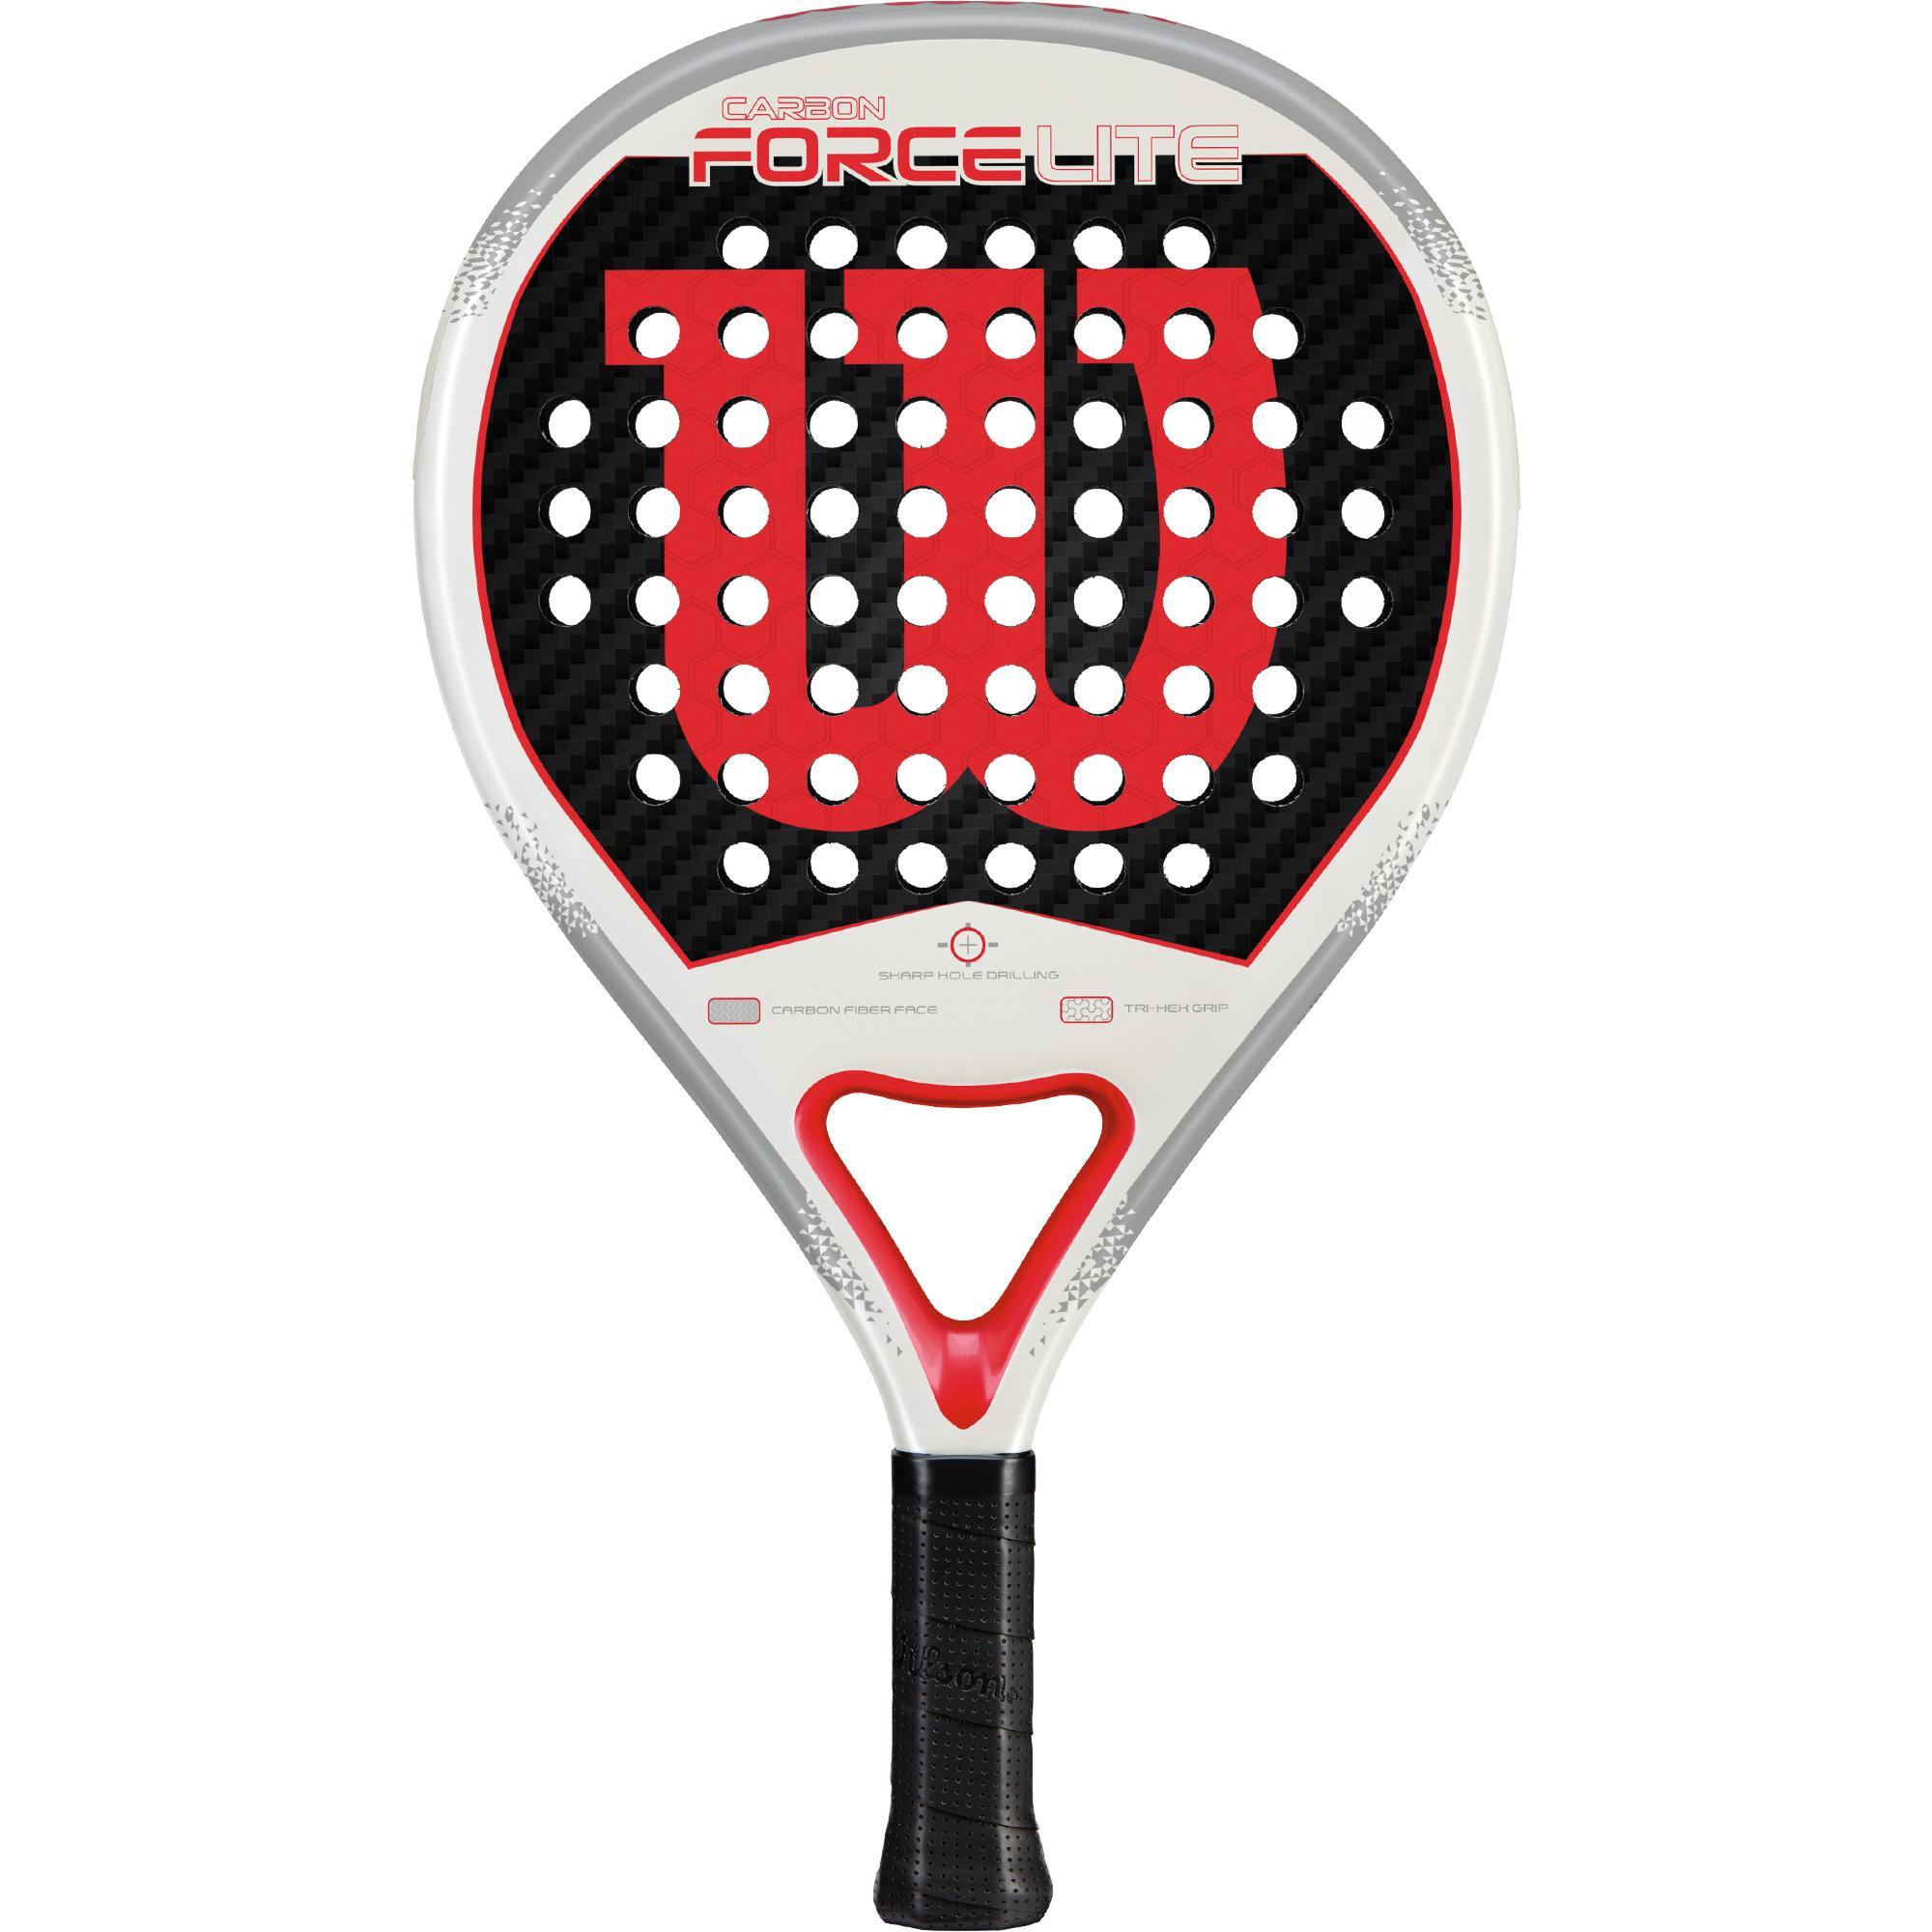 Wilson Carbon Force Lite Padel Racket - Red Black - Tennisnuts.com 239a9053f56c4